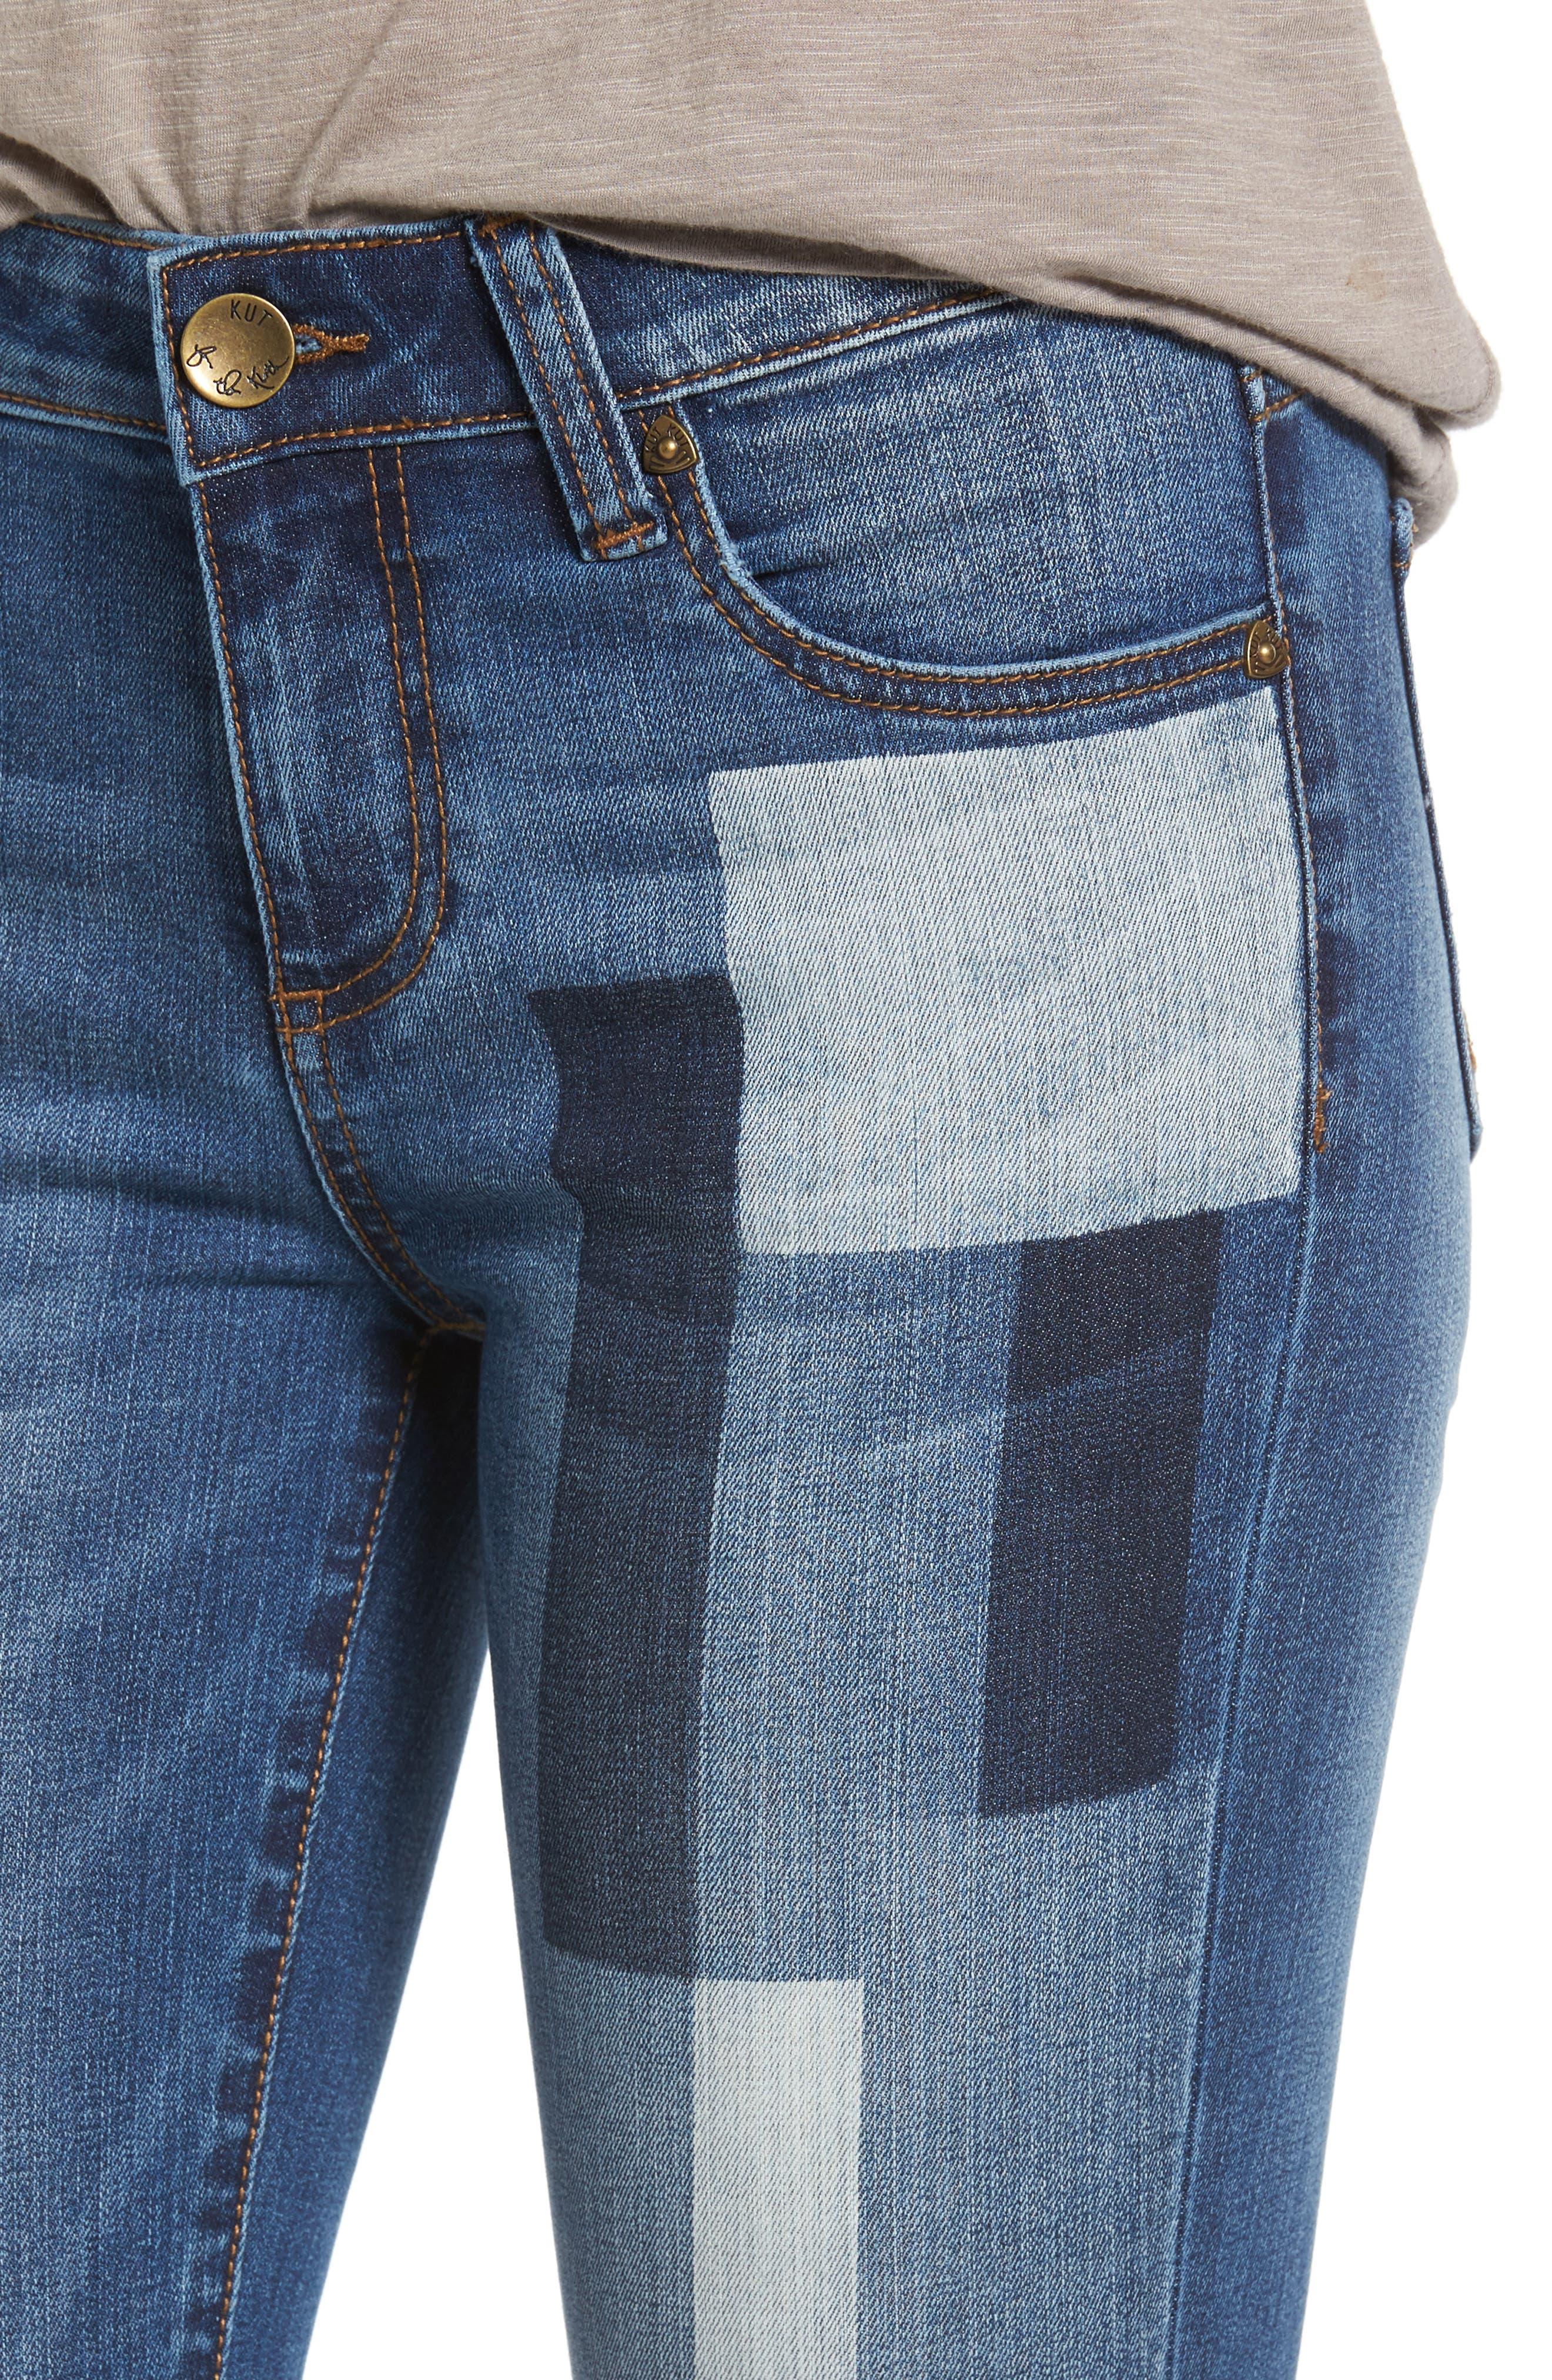 Patchwork Fade Skinny Jeans,                             Alternate thumbnail 4, color,                             Coequal / Dark Stone